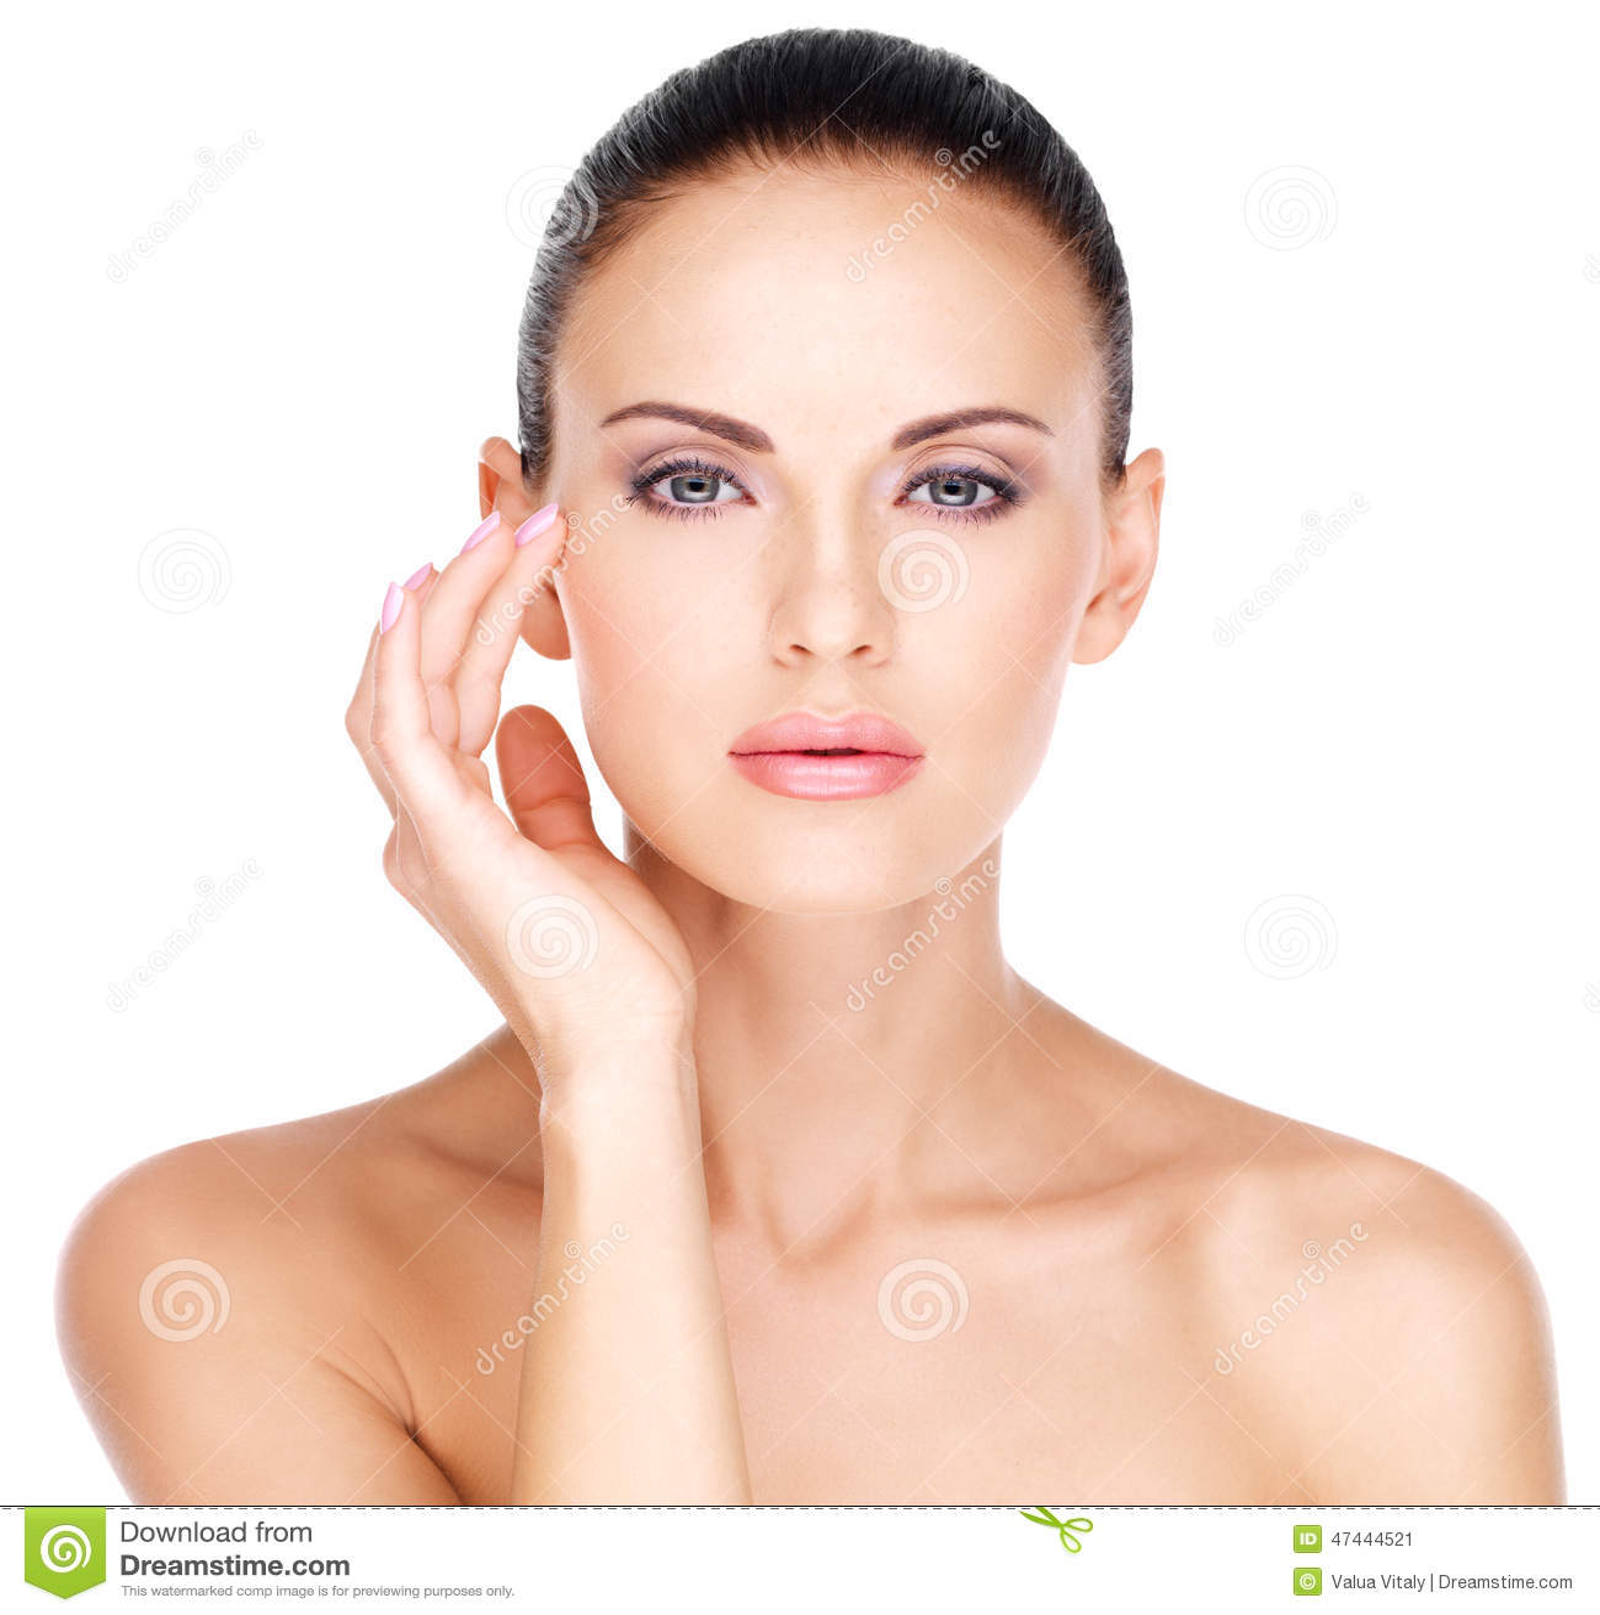 Face Of A Beautiful Woman Who Touching Skin Near Eyes